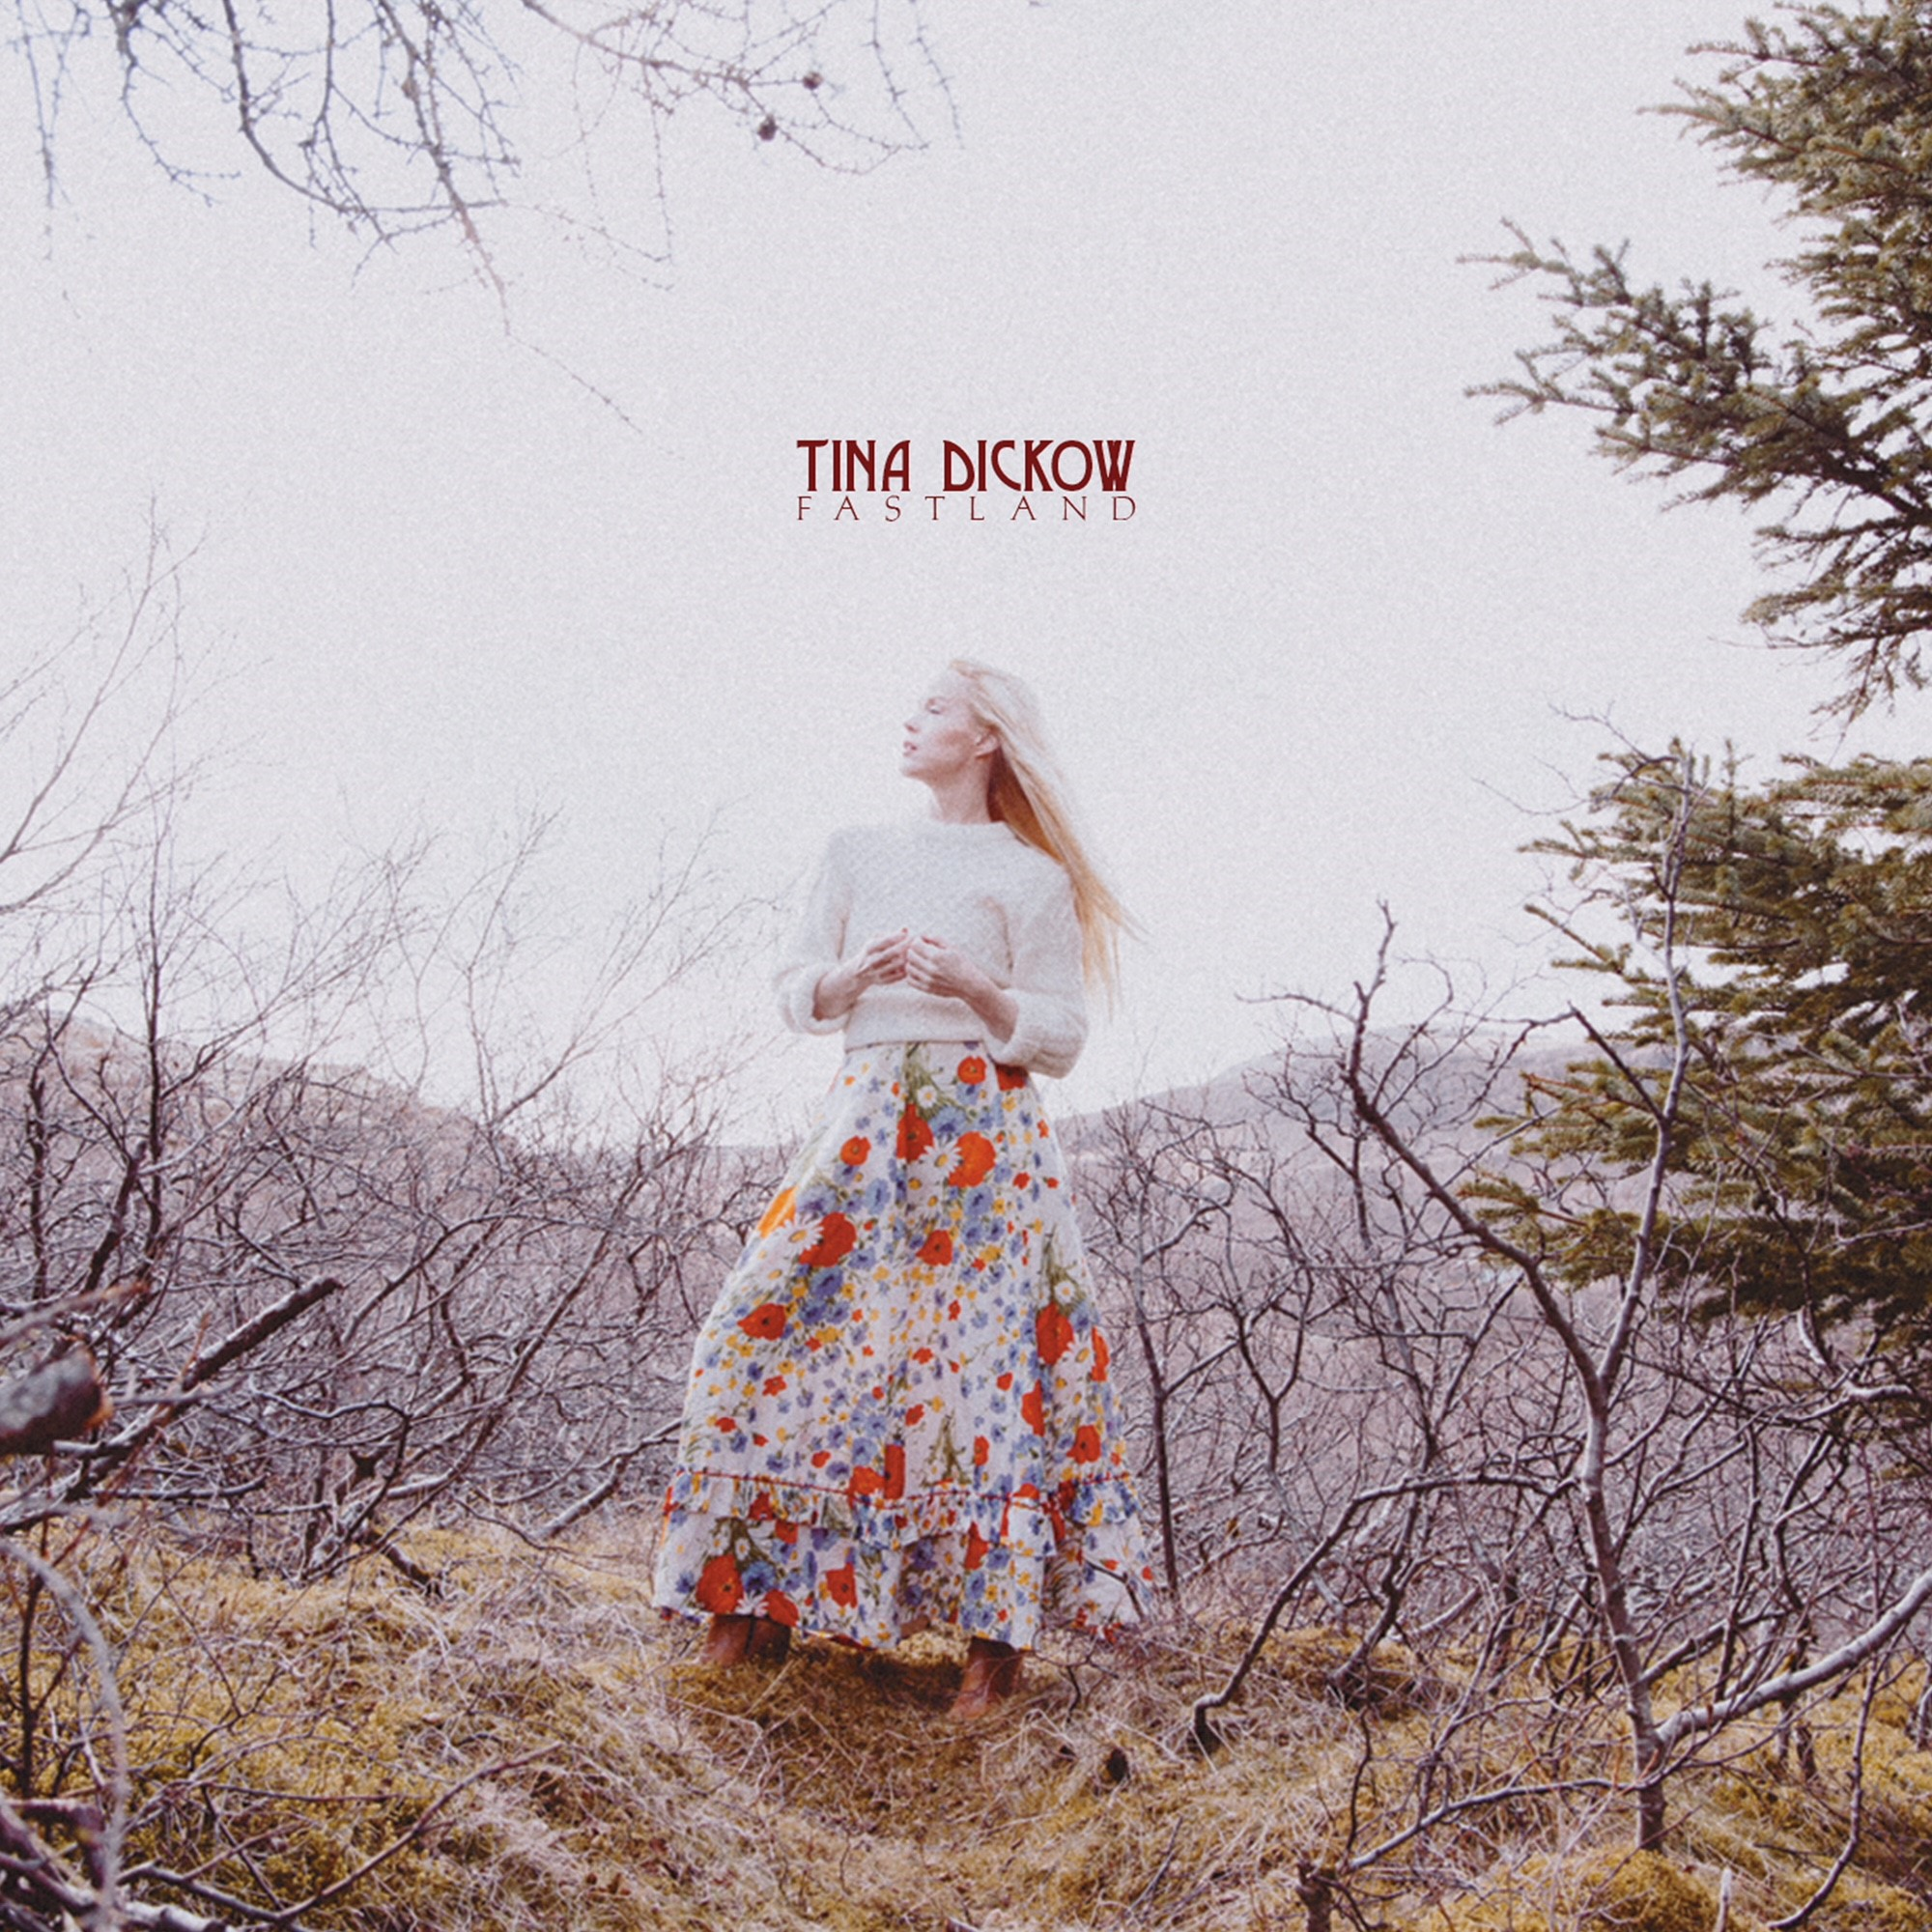 Fastland - Tina Dickow - Musik -  - 0602567792772 - 28/9-2018